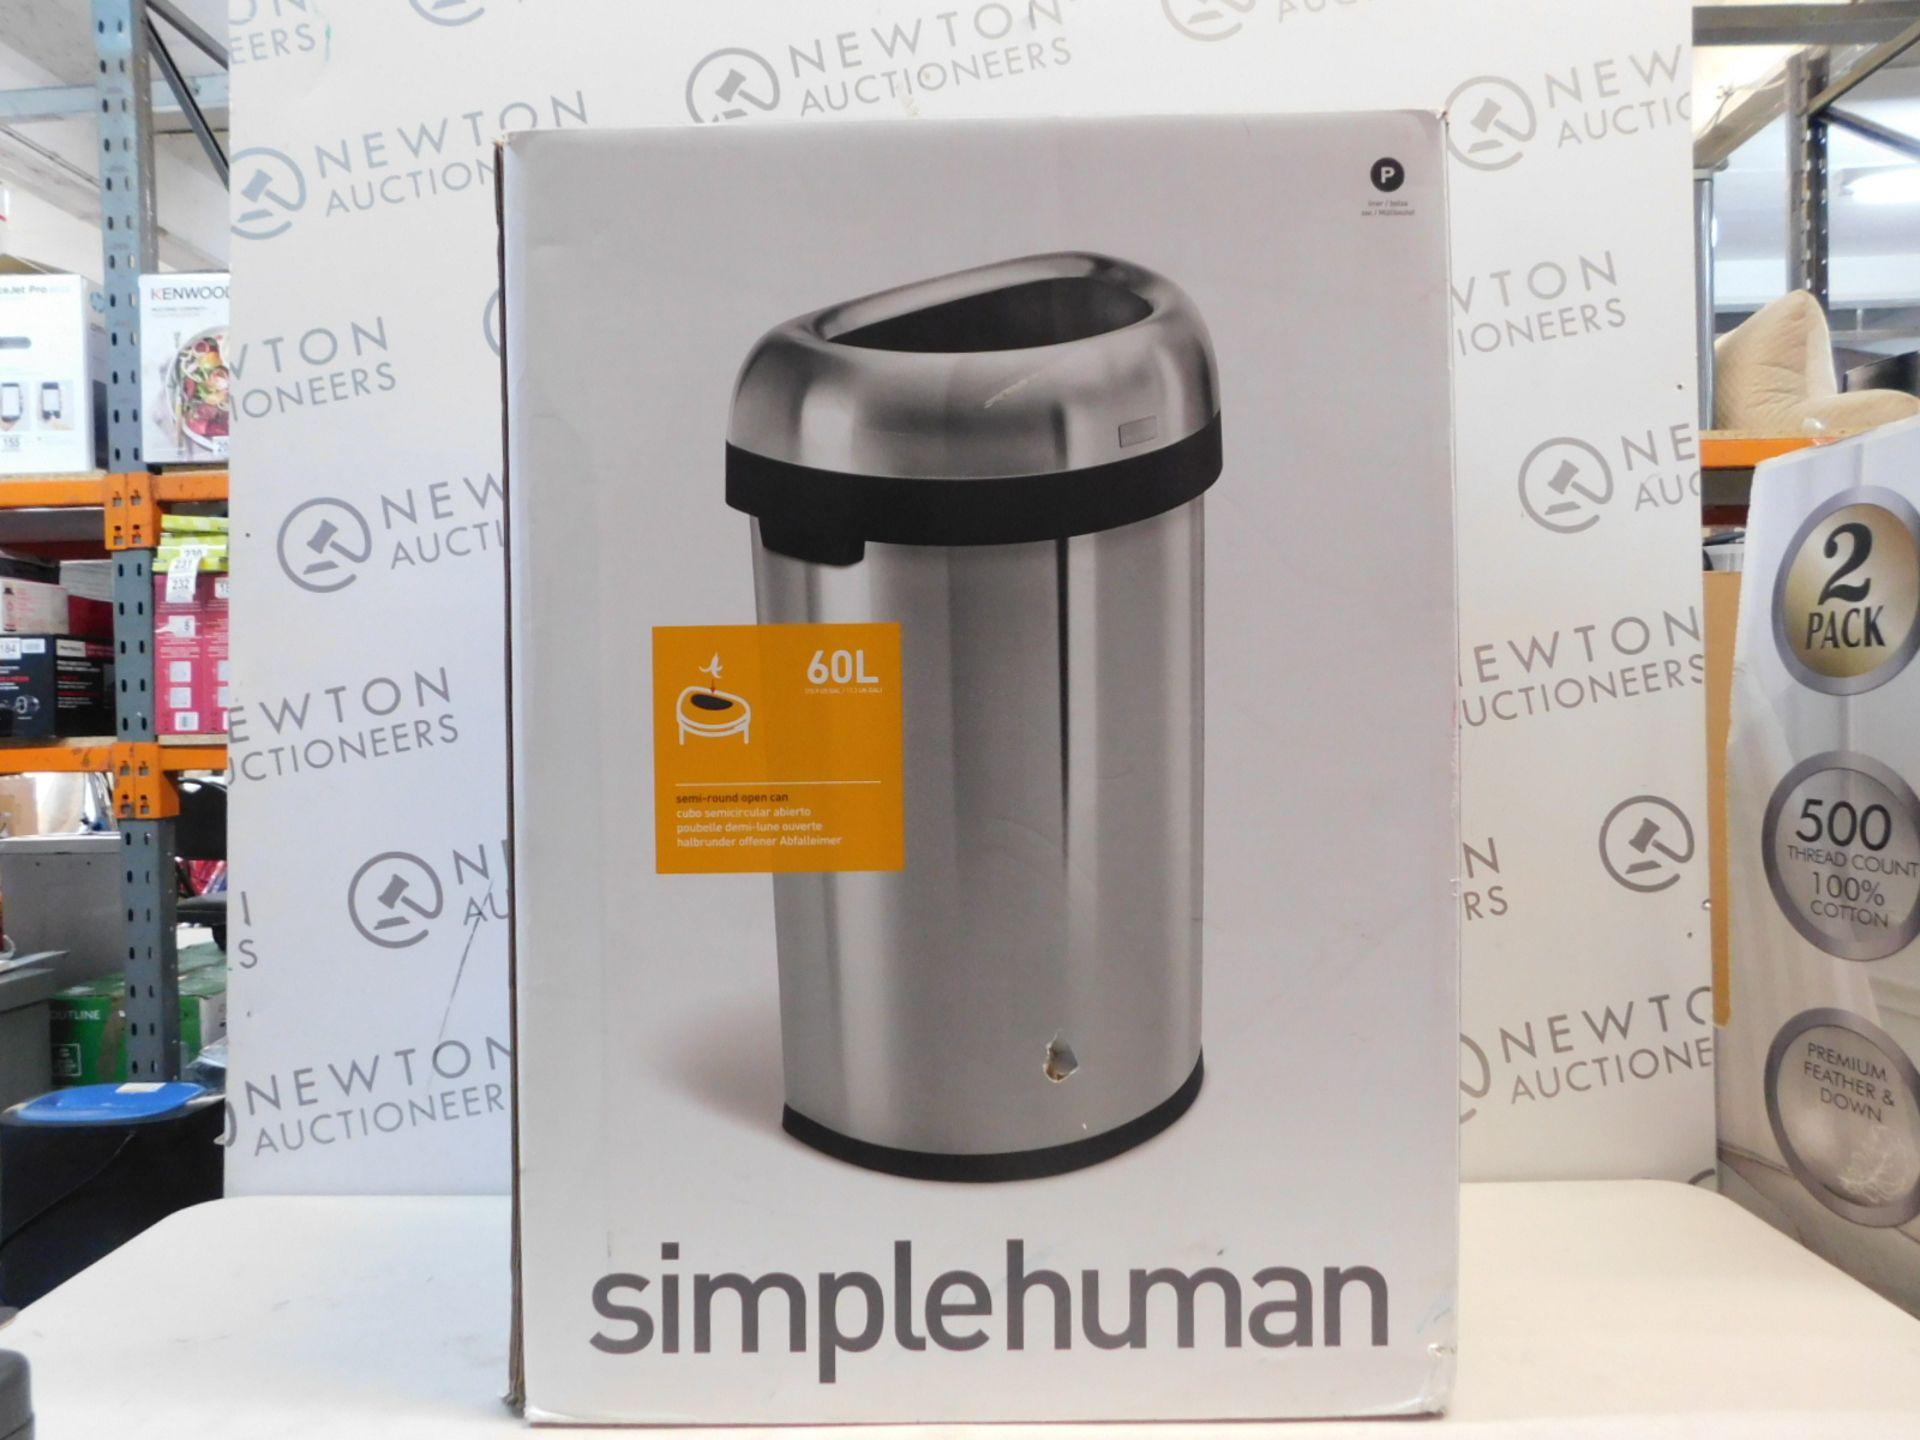 1 BOXED SIMPLEHUMAN 60L SEMI-ROUND OPEN CAN BIN RRP £199